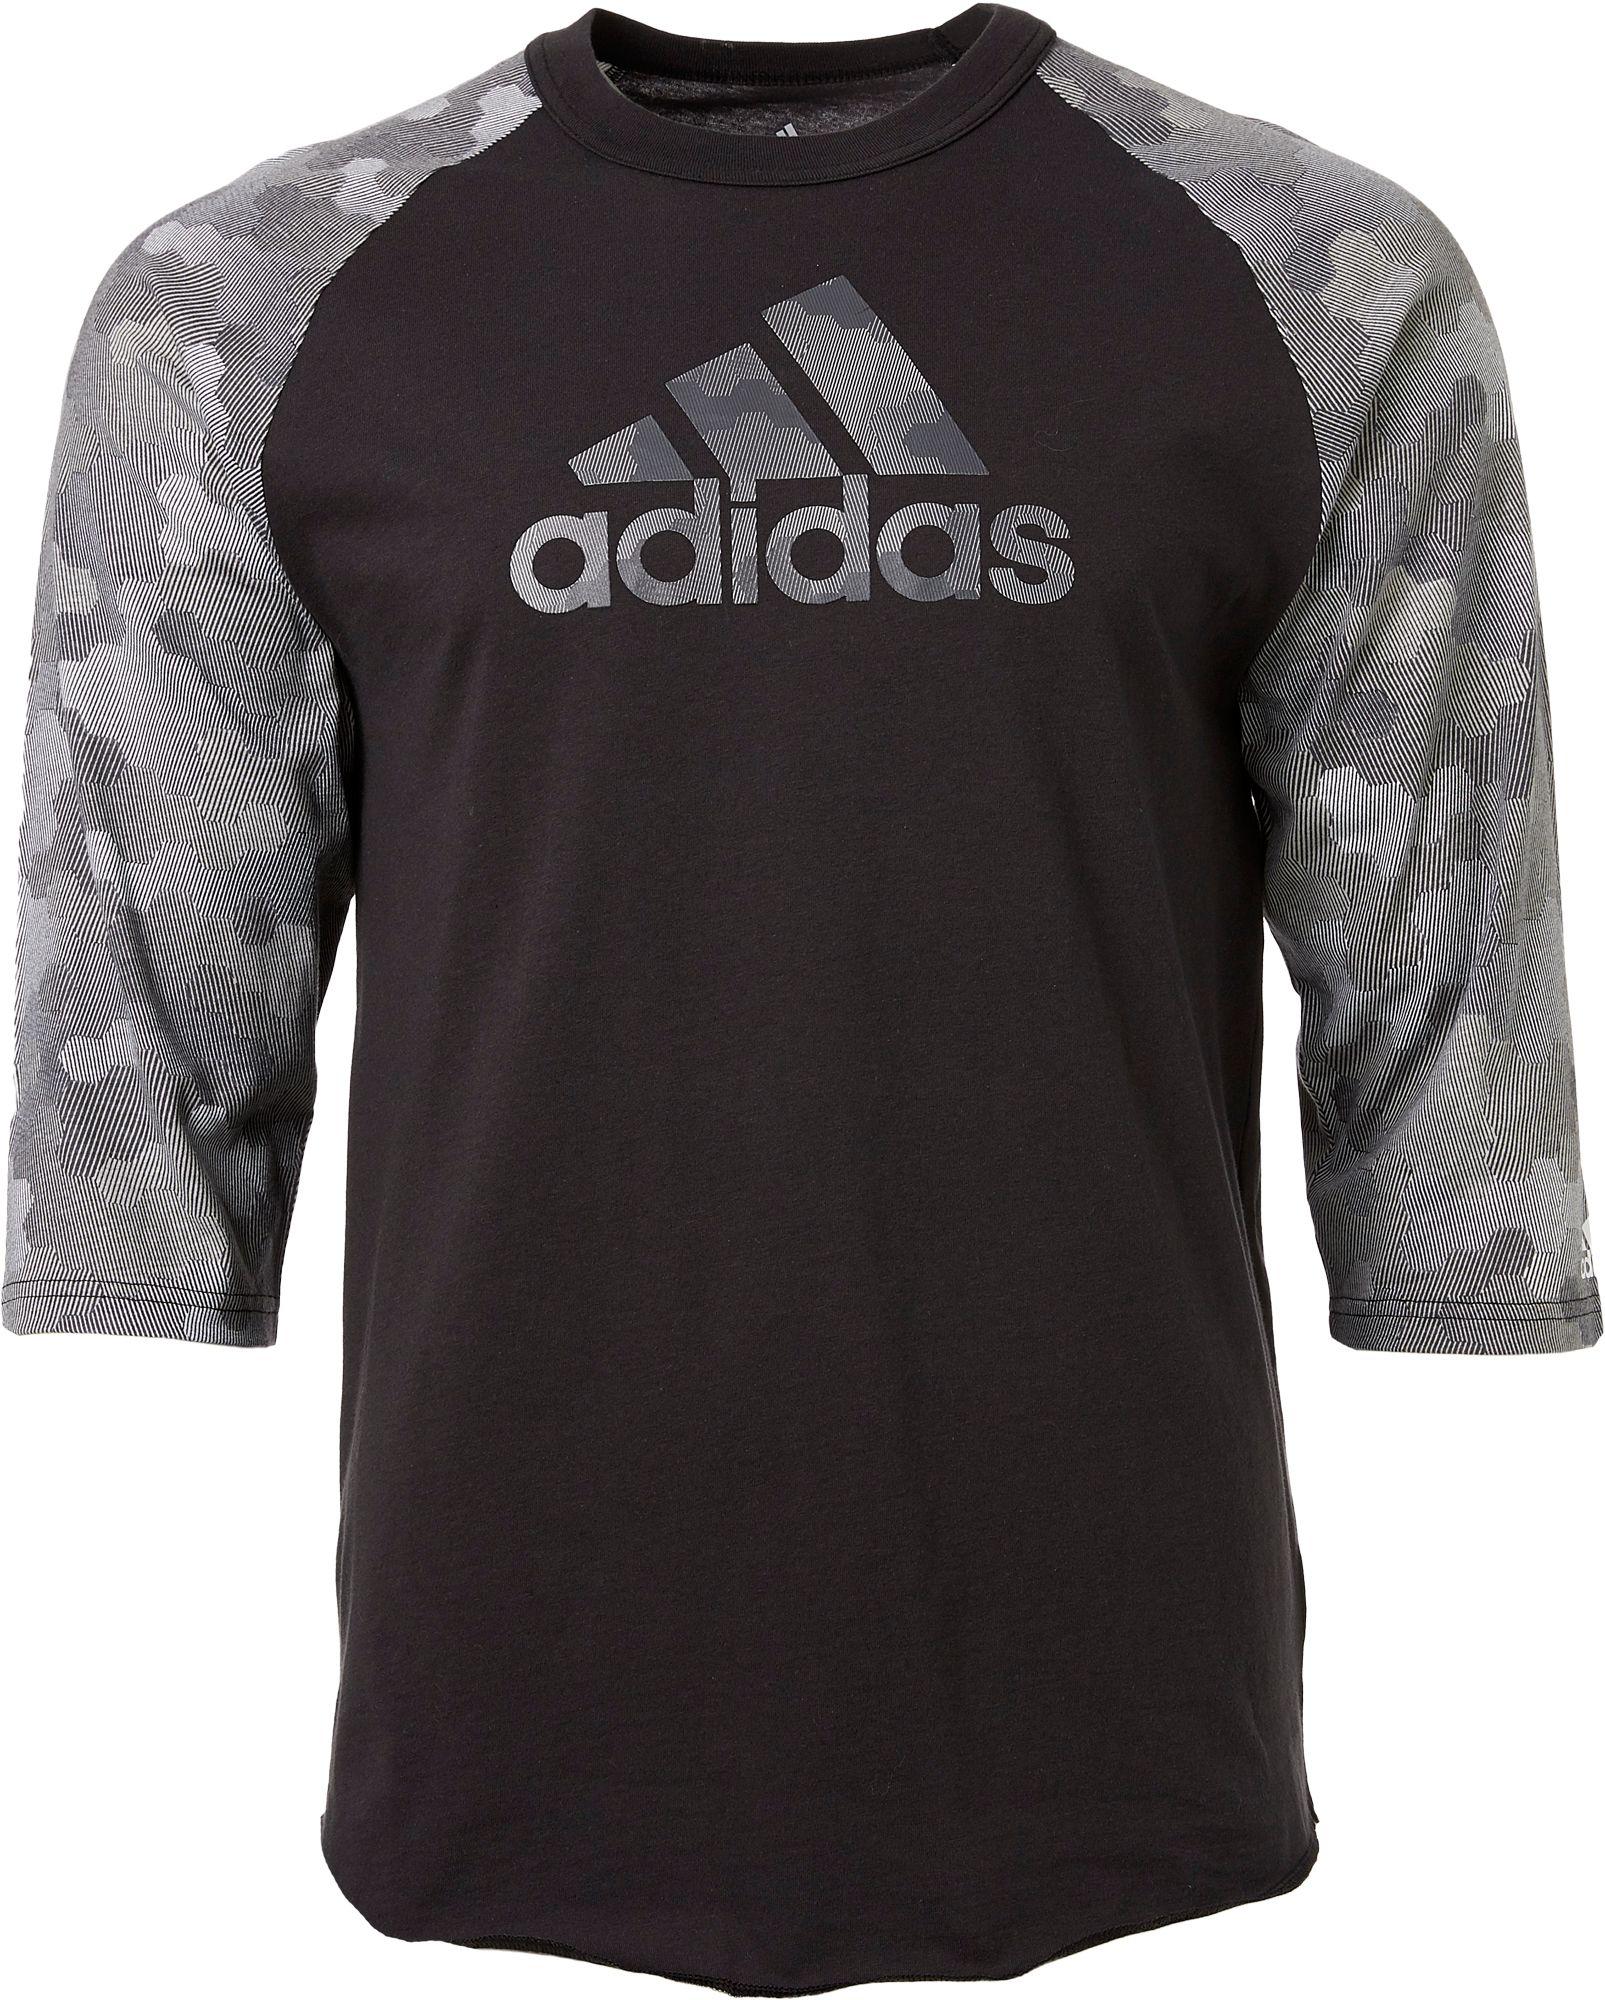 adidas Boys' Triple Stripe Printed ¾ Sleeve Baseball Graphic Shirt, Boy's, Size: XS, Grey Digi Camo Print thumbnail